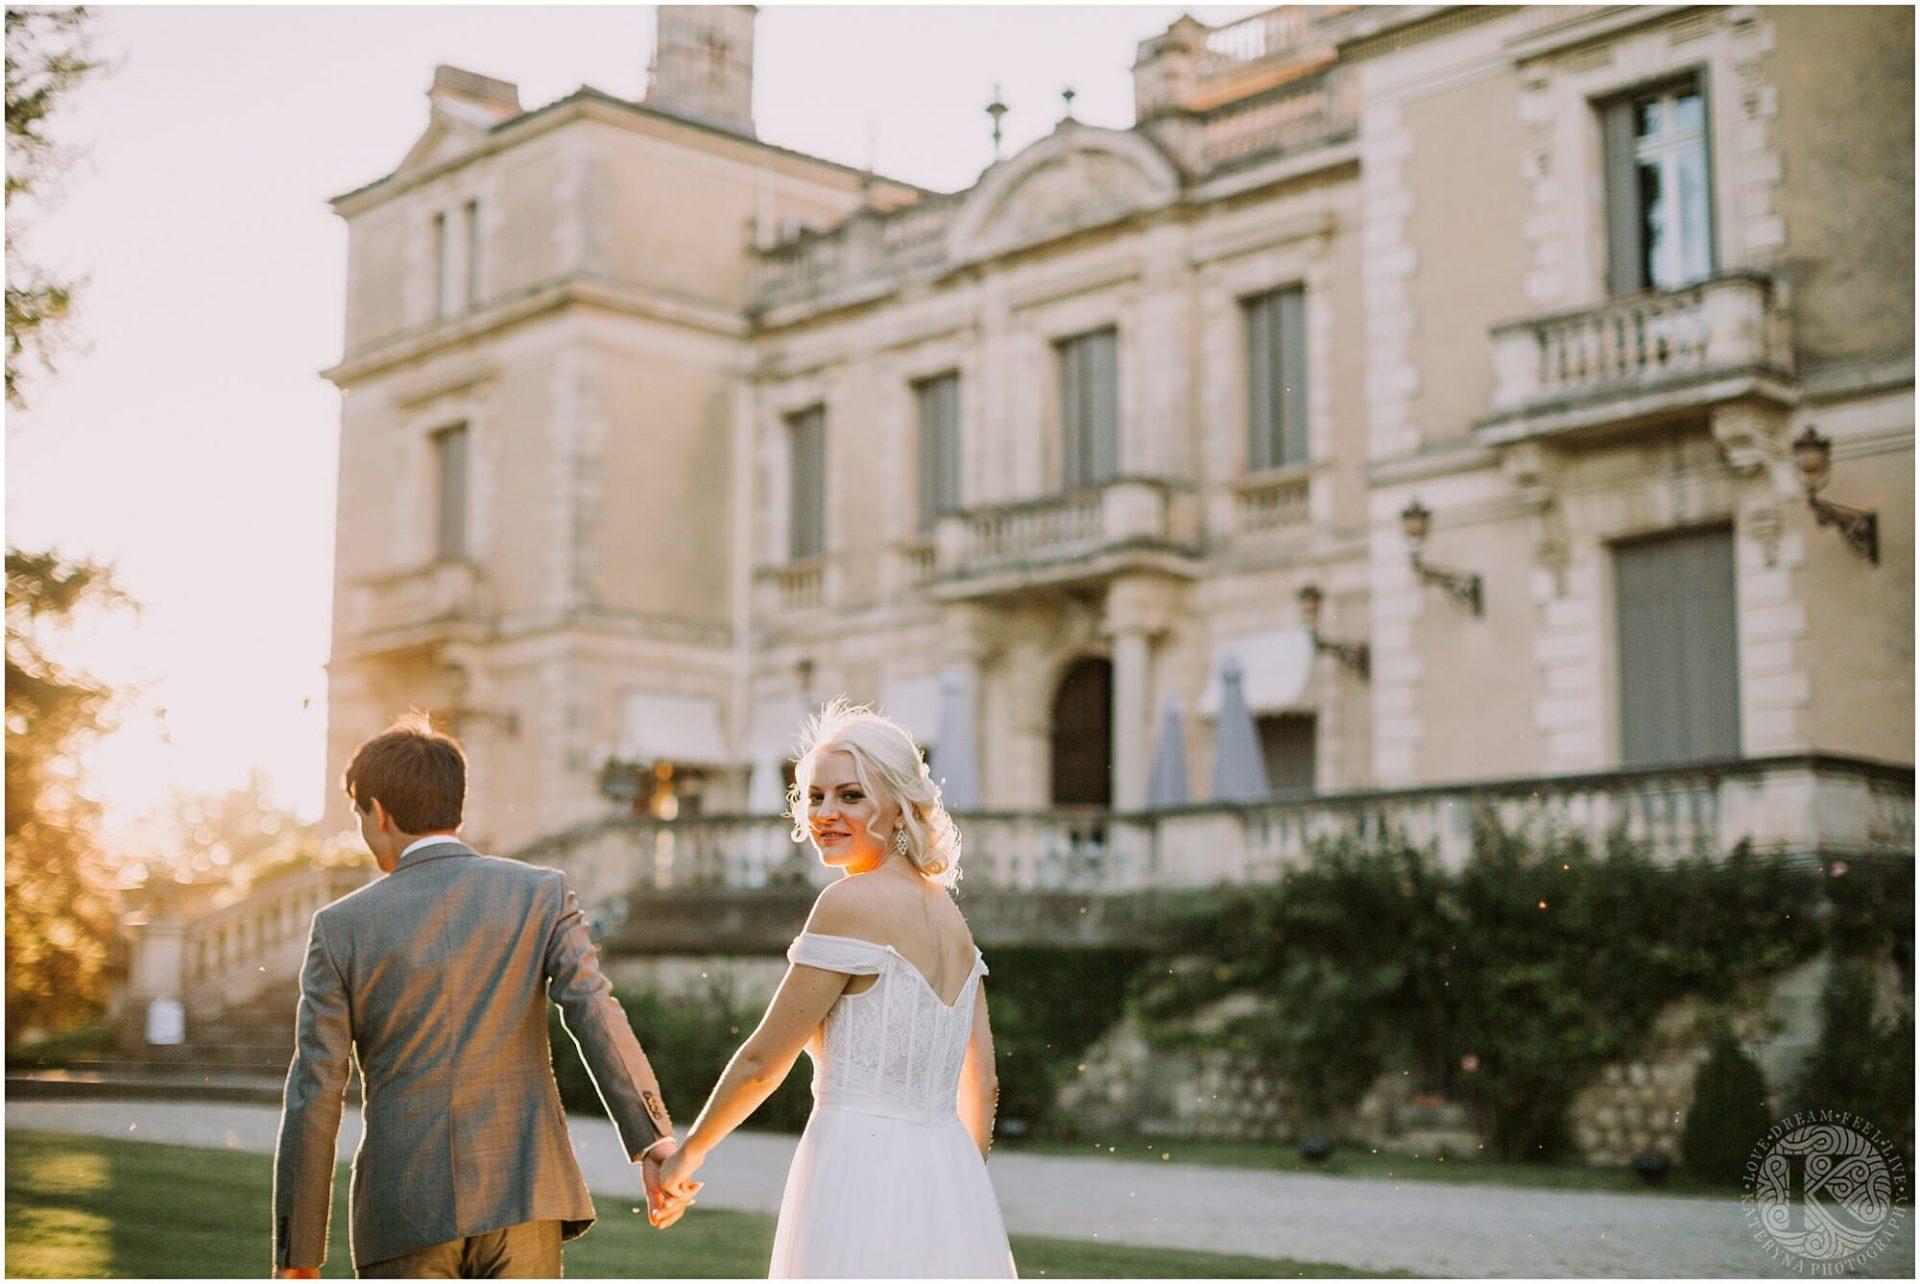 Kateryna-photos-photographe-mariage-chateau-des-3-fontaines-provence-avignon-vaucluse-sud_0096.jpg